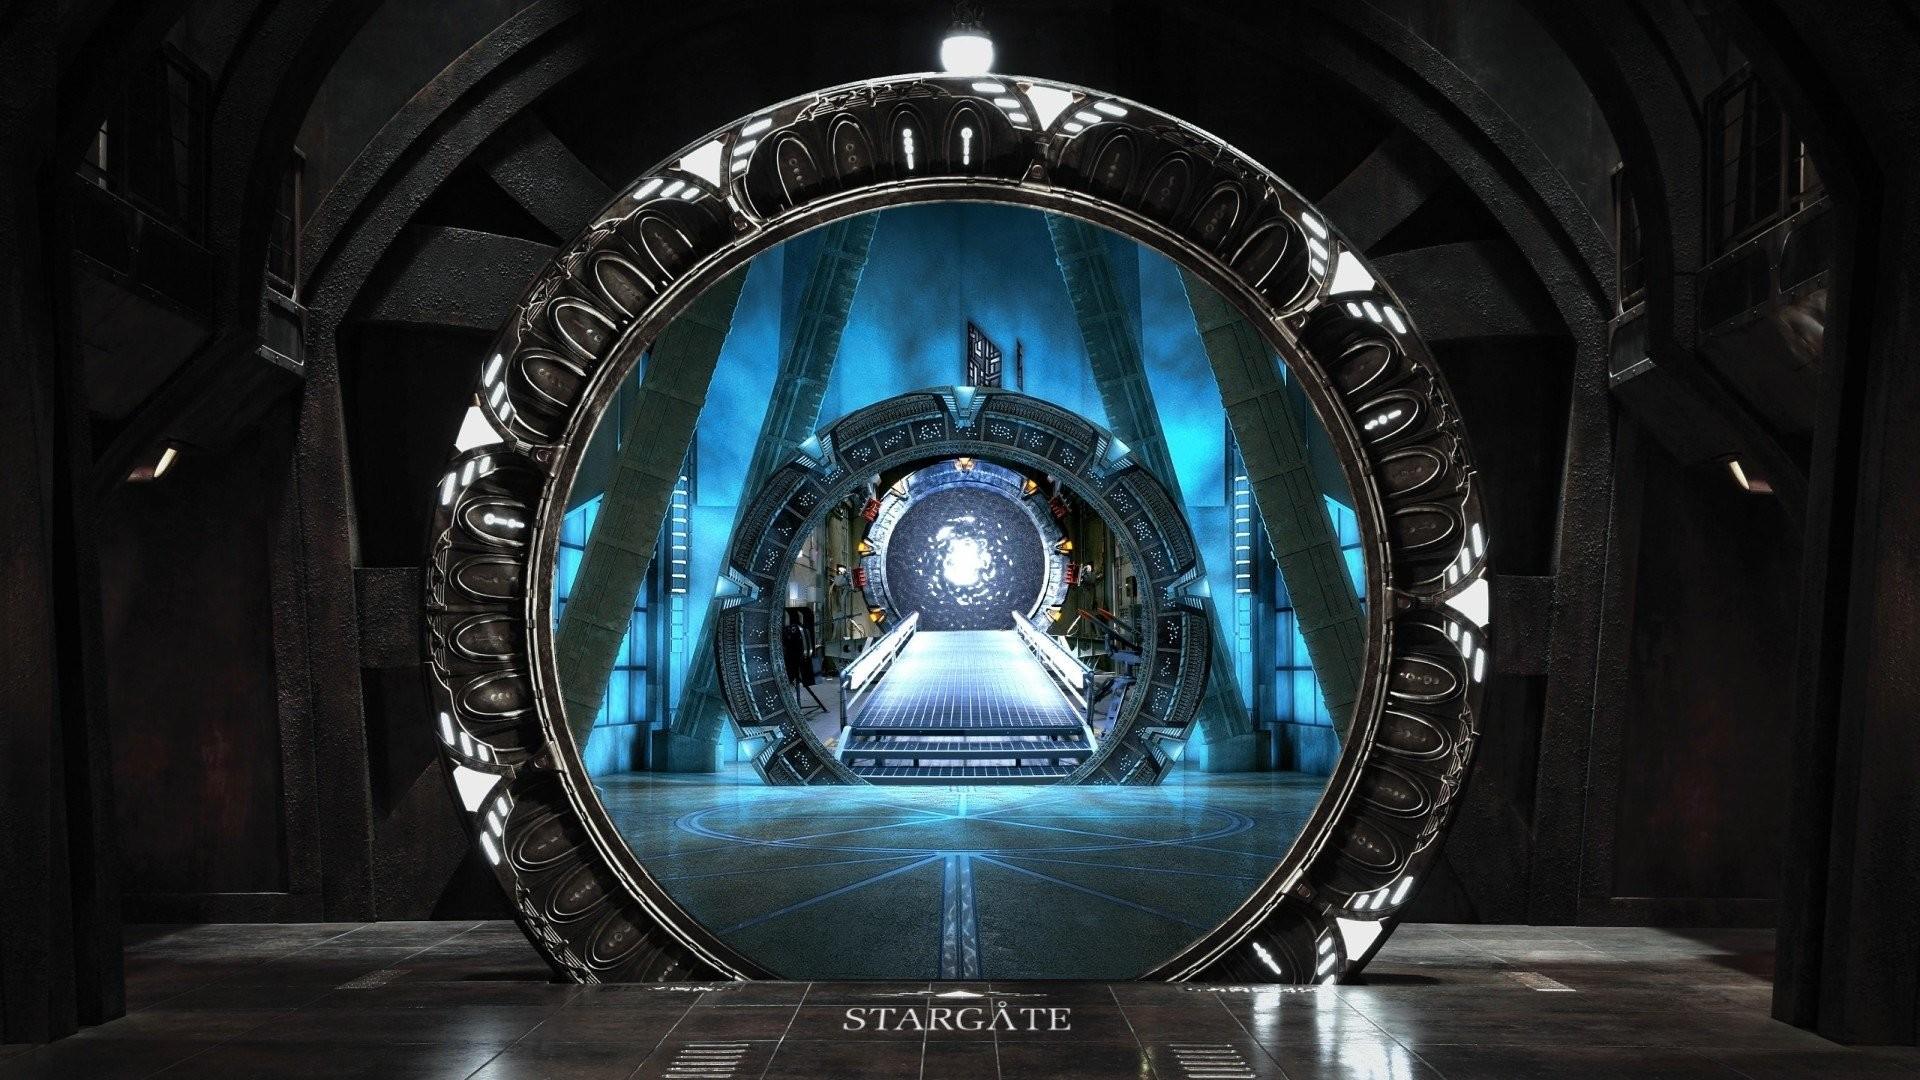 Stargate Wallpaper Hd